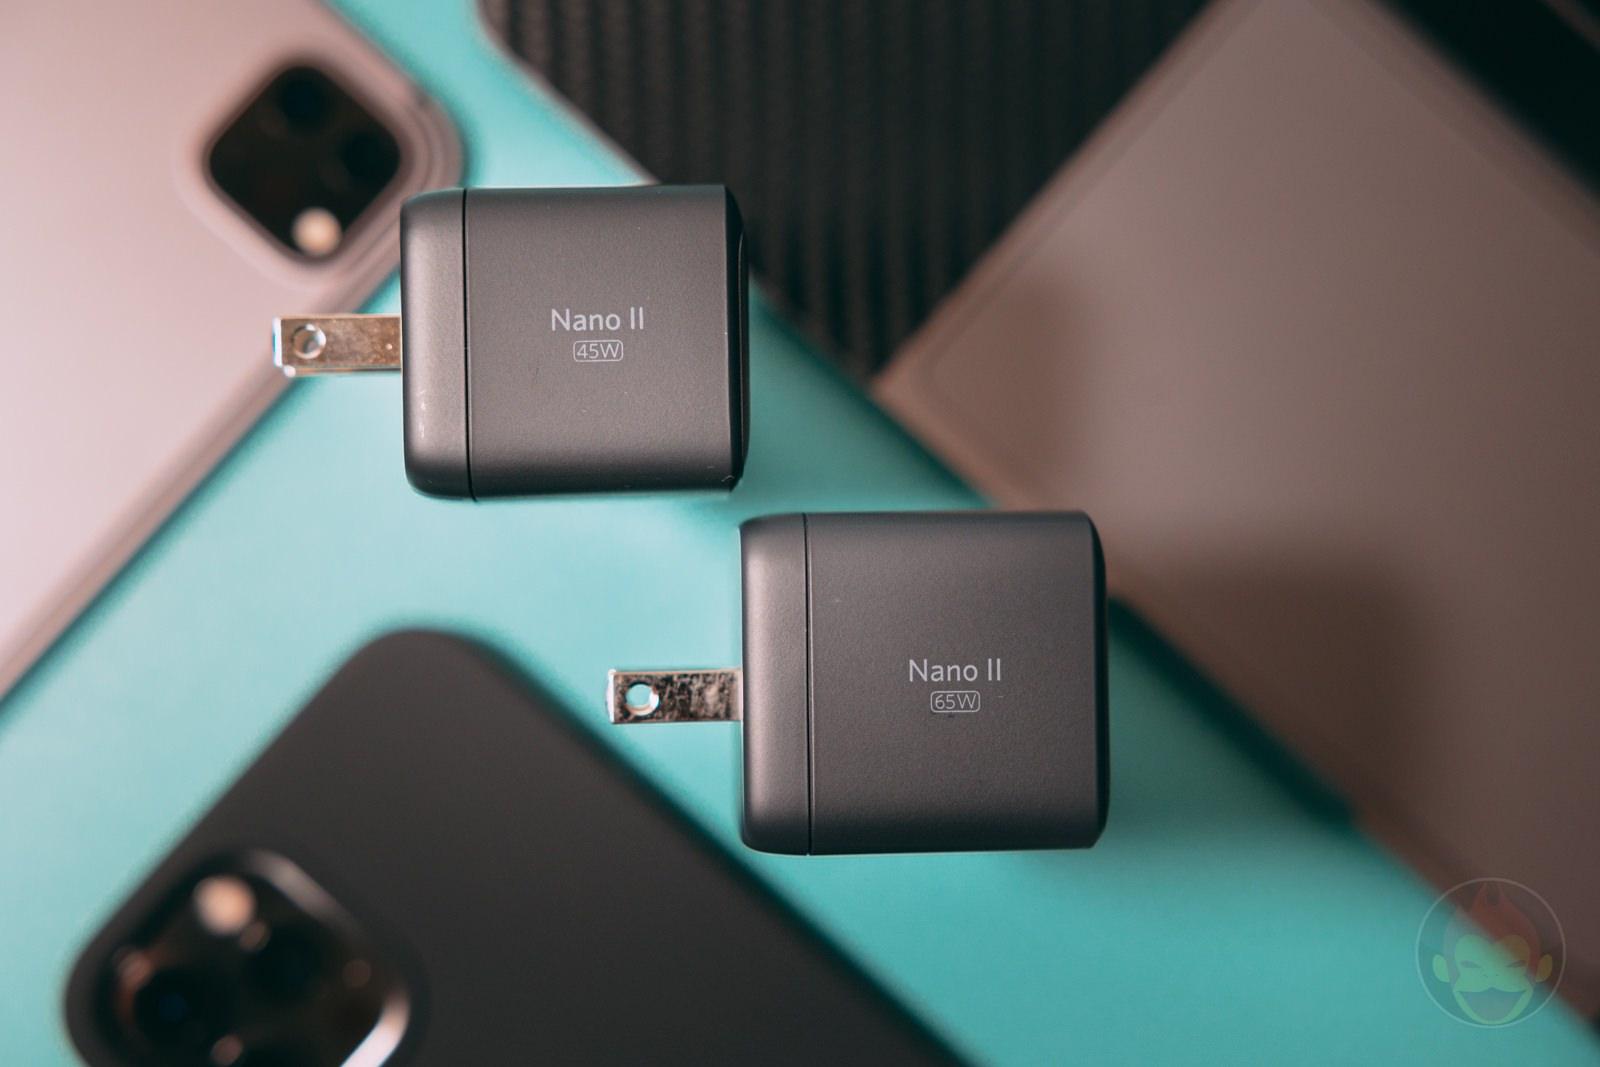 Anker-Nano-II-45W-and-65W-review-09